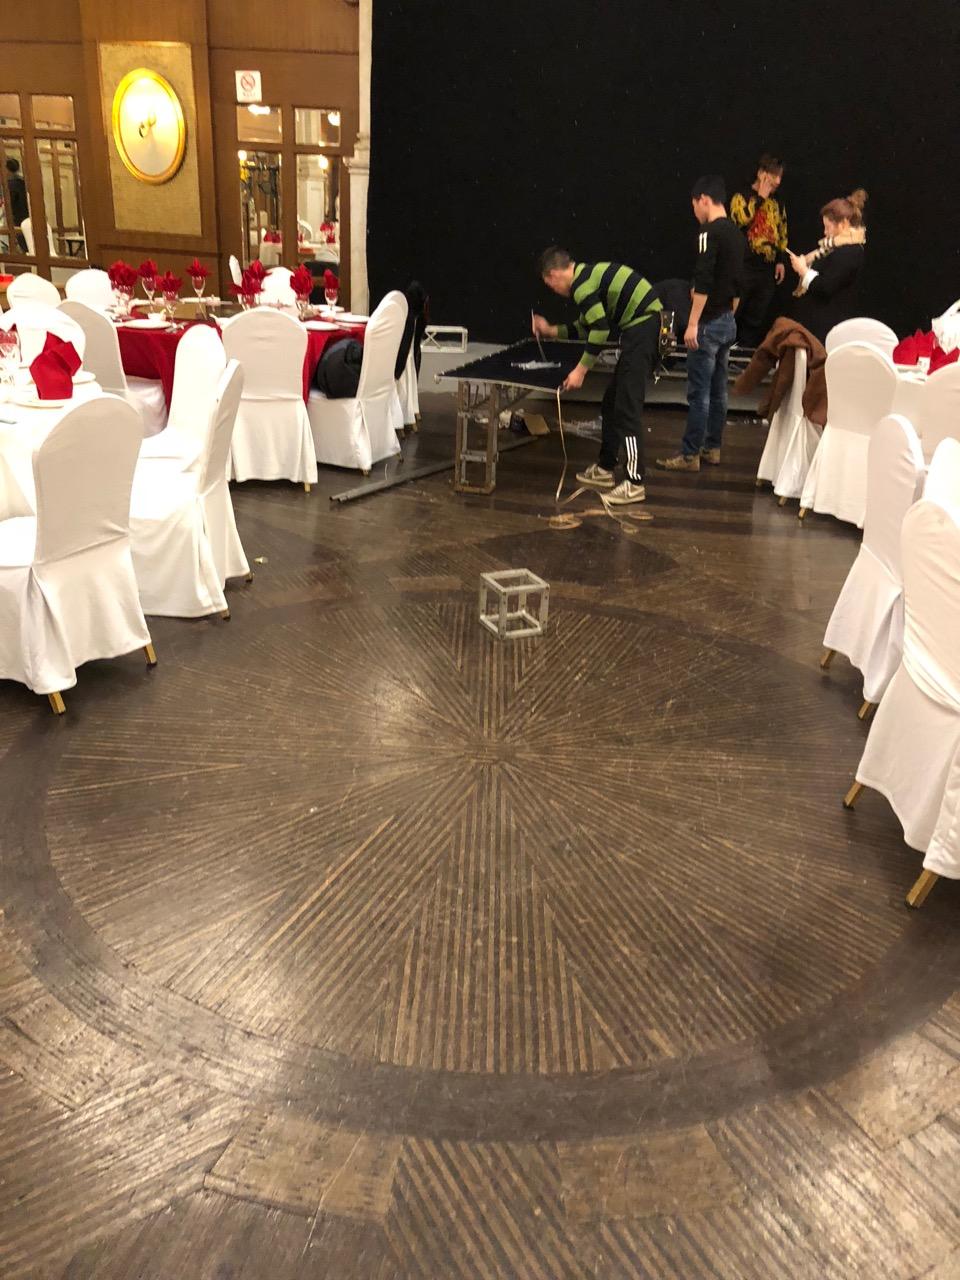 The Ballroom dance floor--almost 100 years old